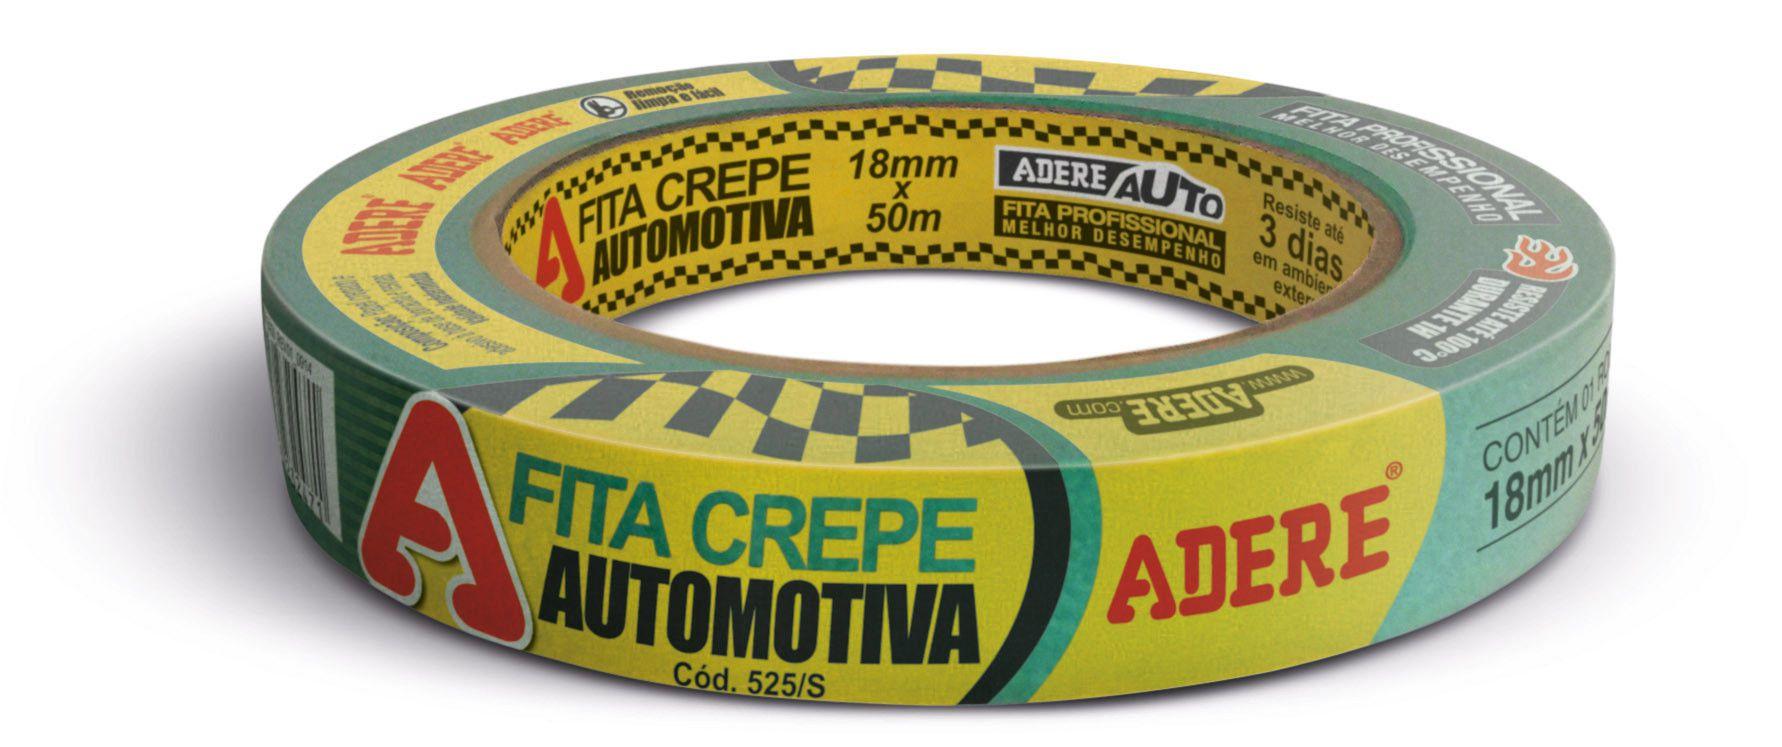 Fita Crepe Automotiva 525s Verde Adere - 10 Rolos